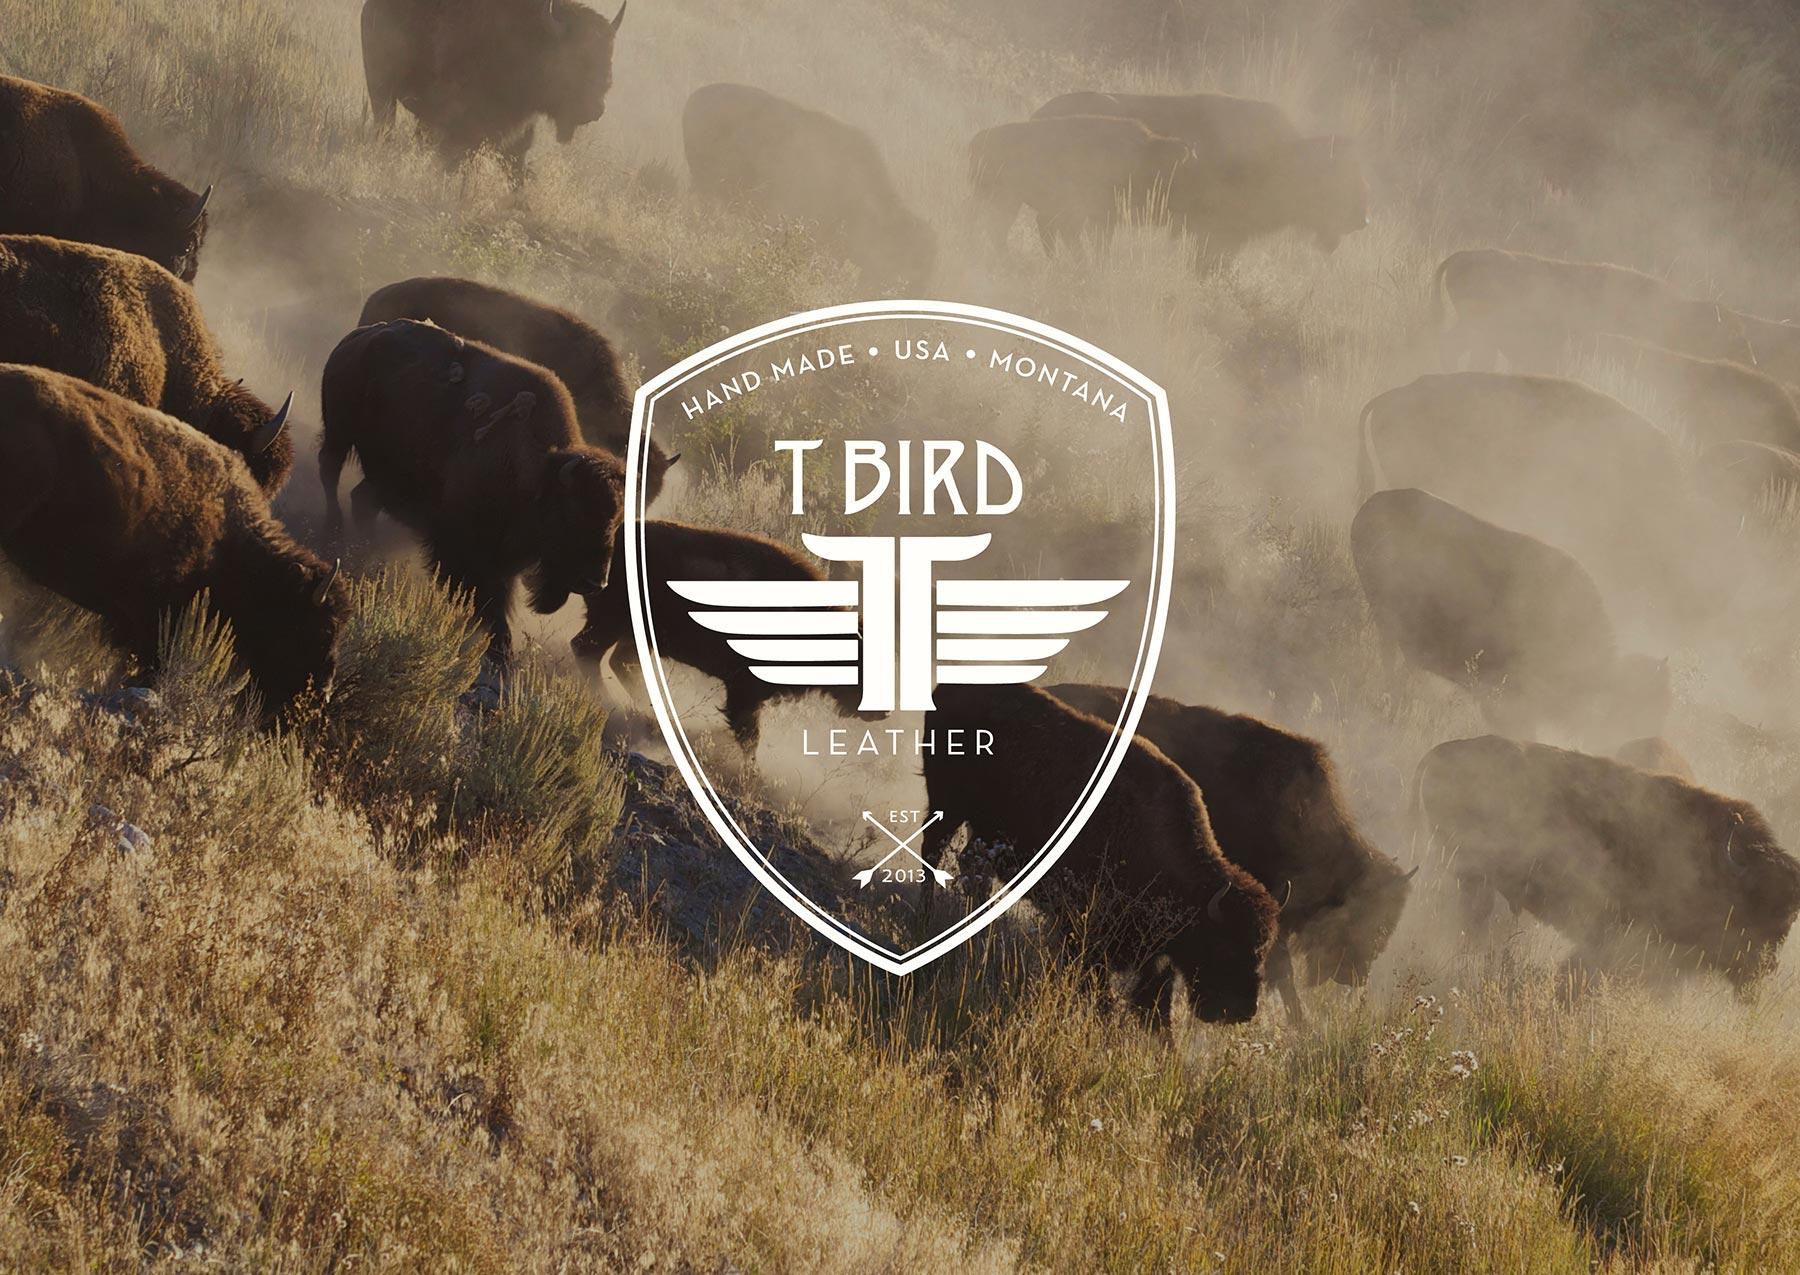 tbird leather_welcome.jpg